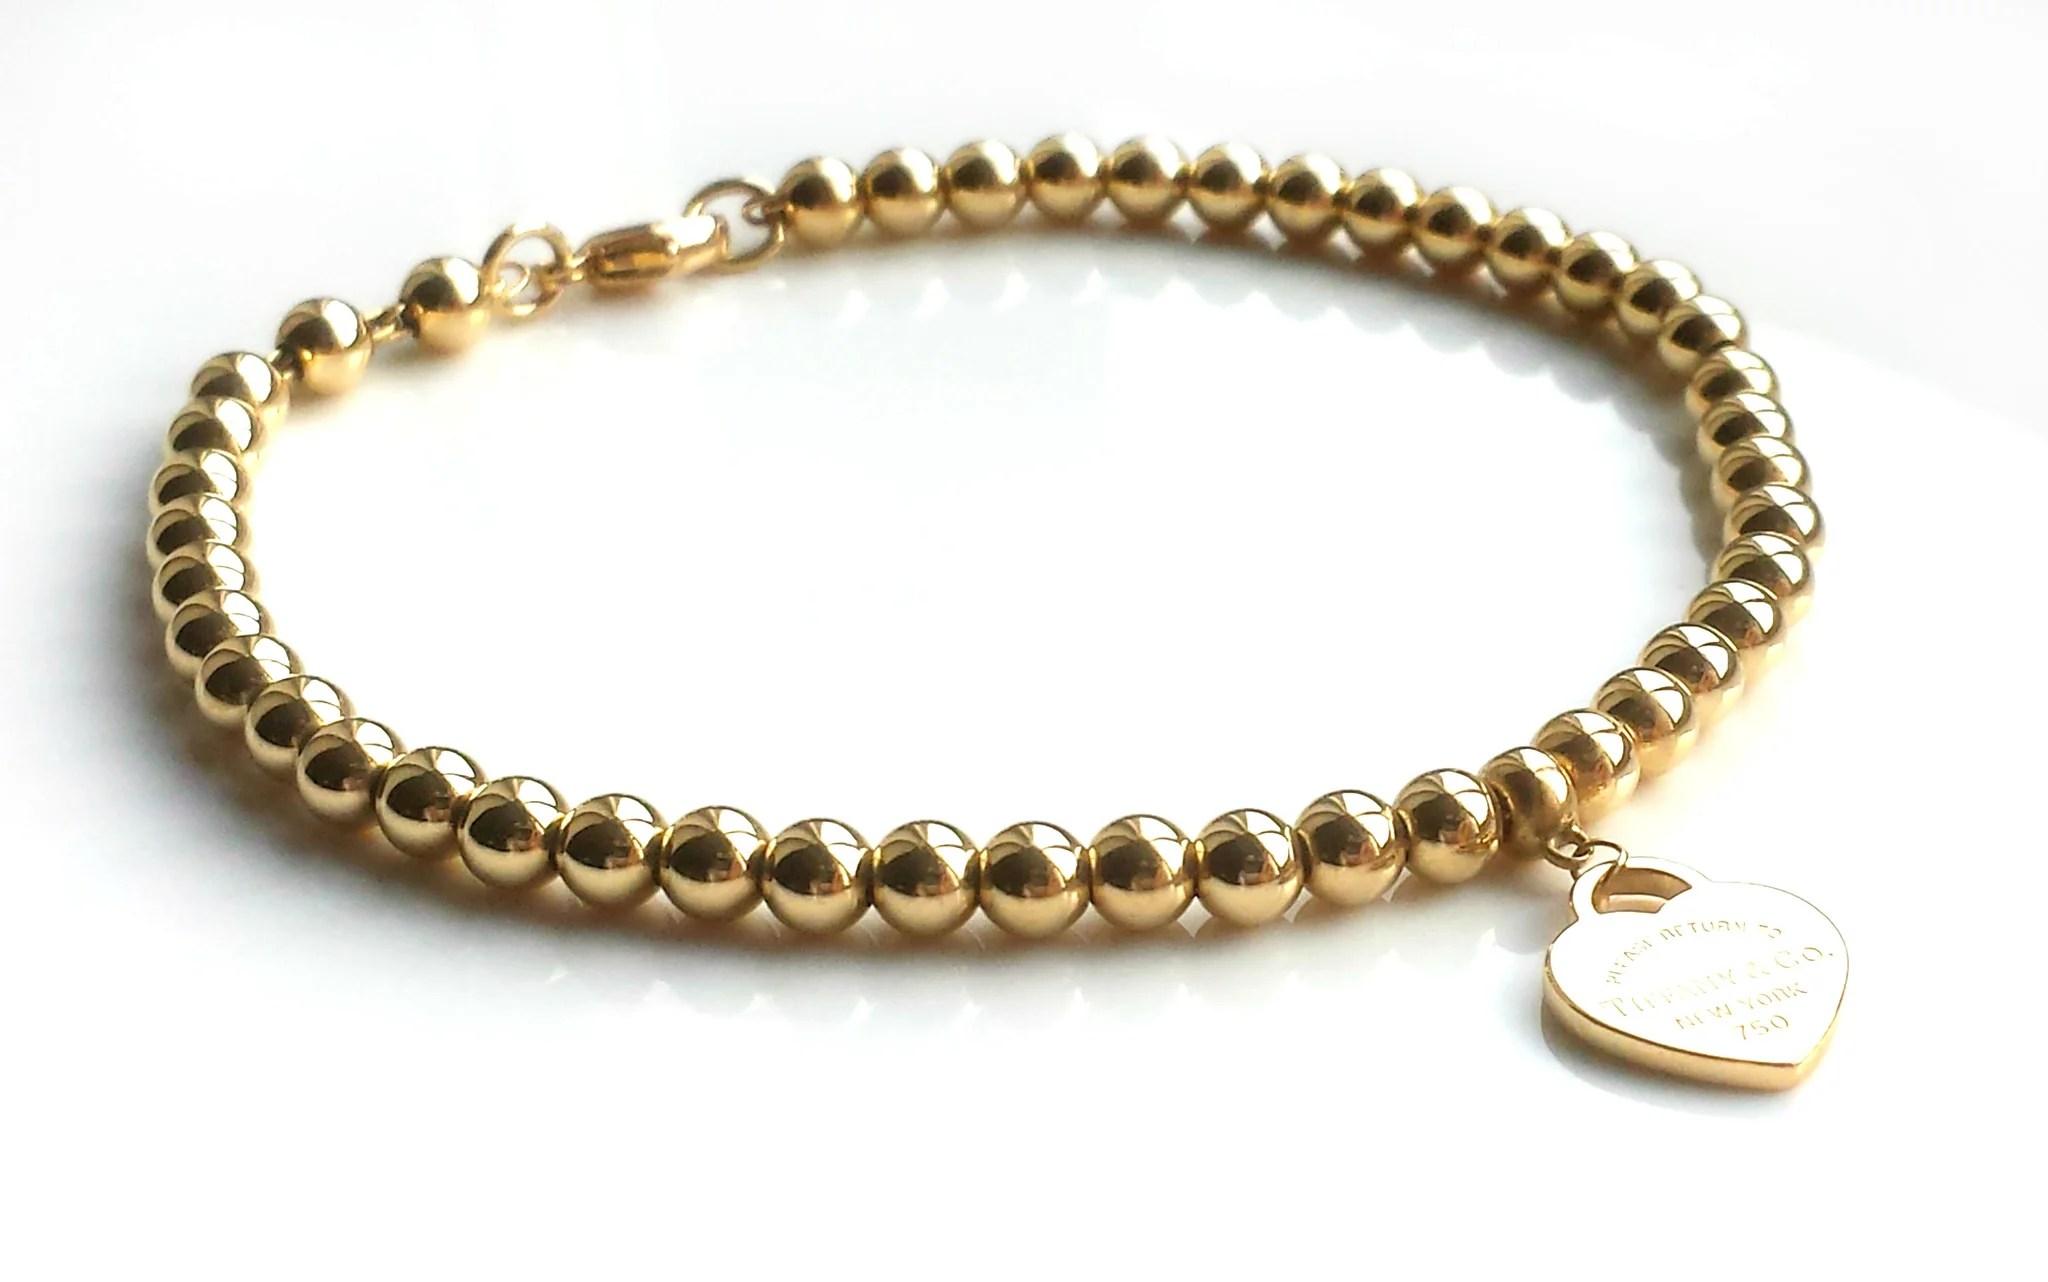 Tiffany & Co. Return to 18k Yellow Gold Bead Bracelet & Mini Heart Tag - Bloomsbury Manor Ltd